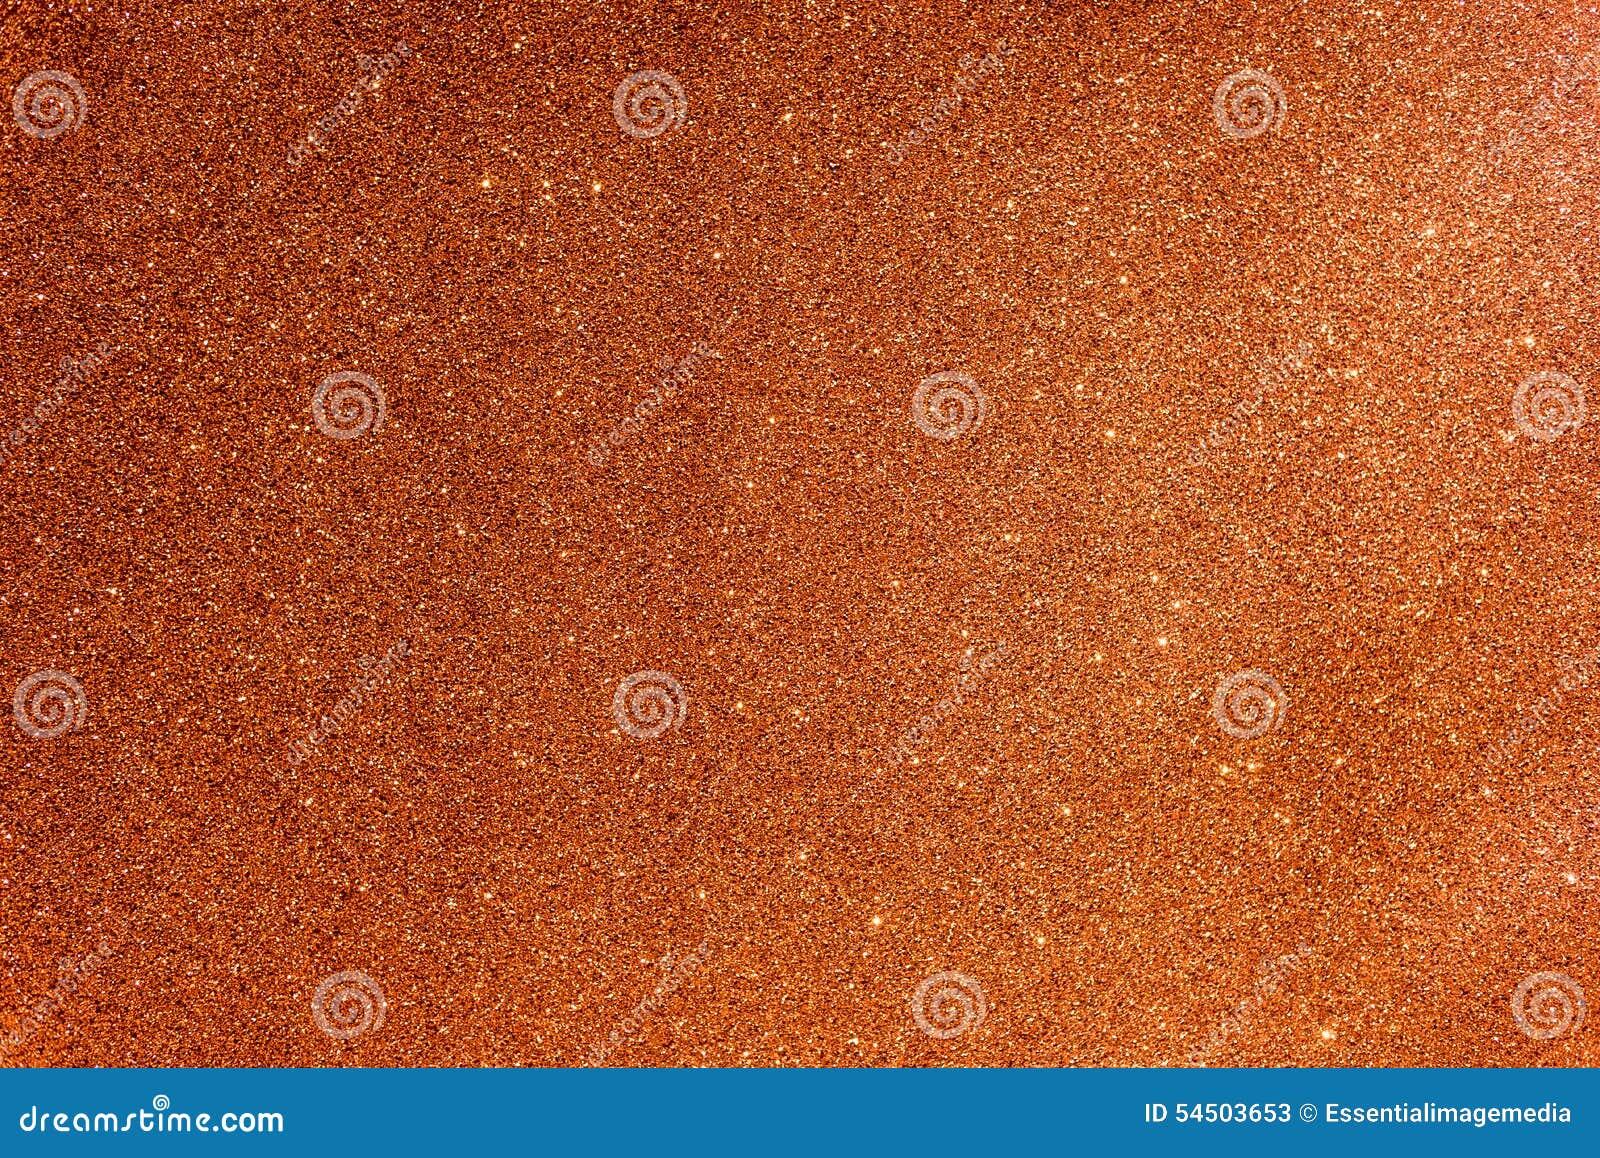 Rusty Sandpaper Background